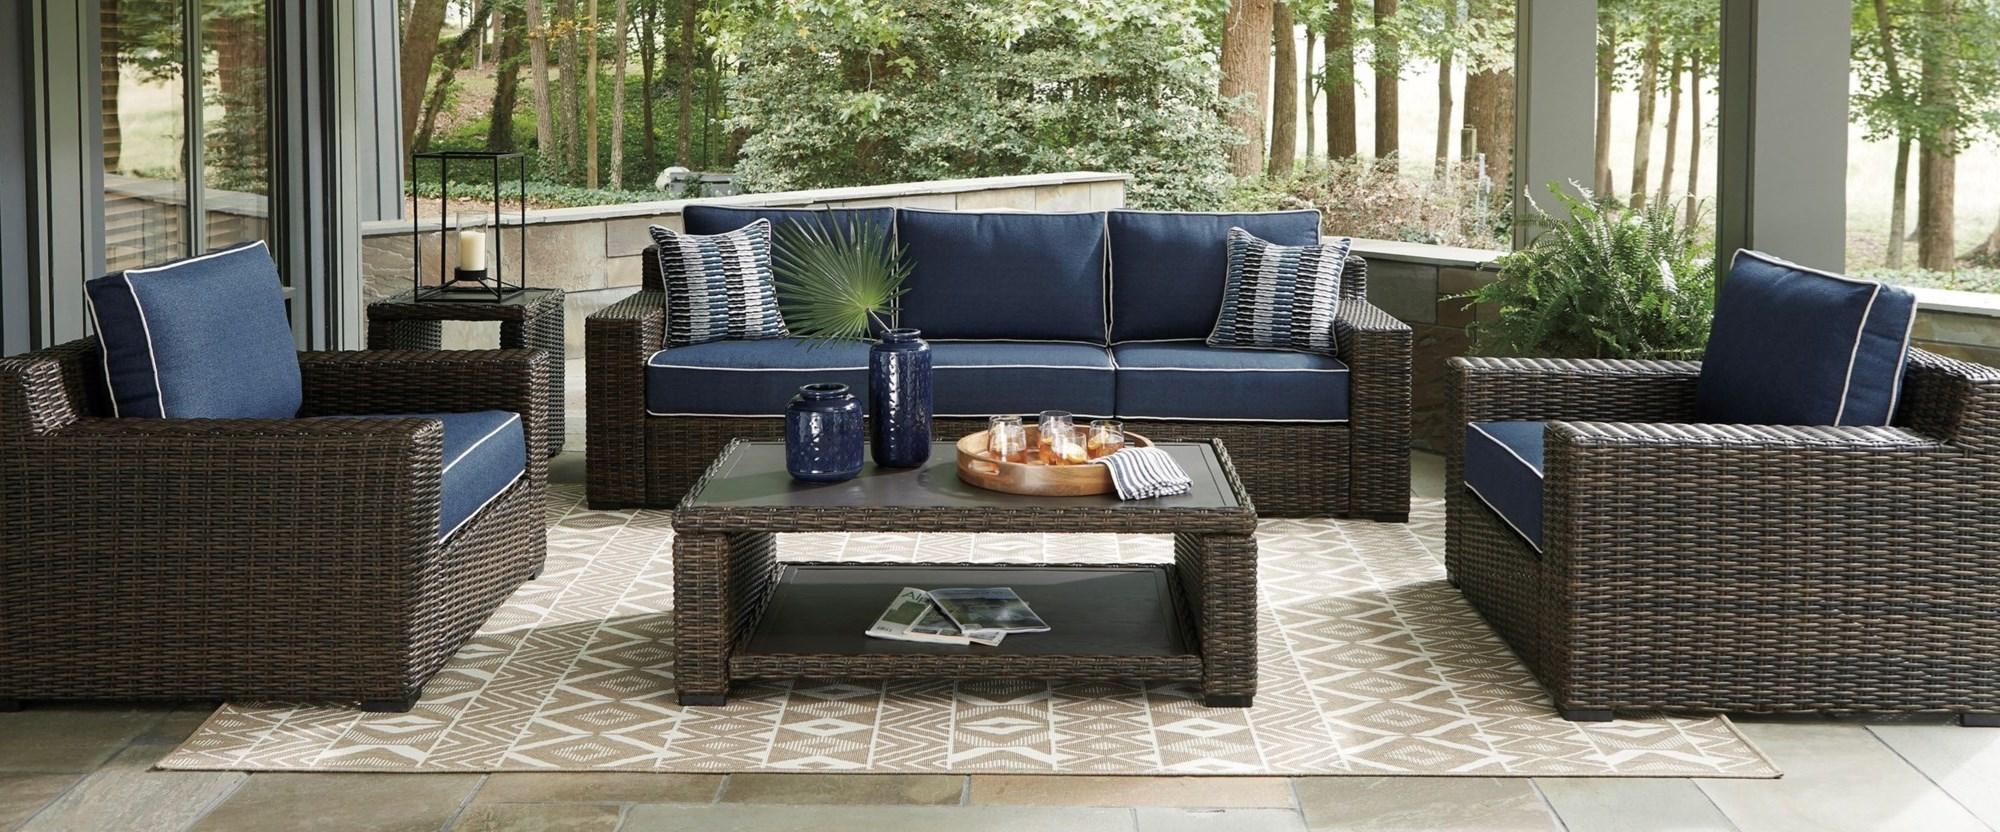 Grandmoore Outdoor Sofa